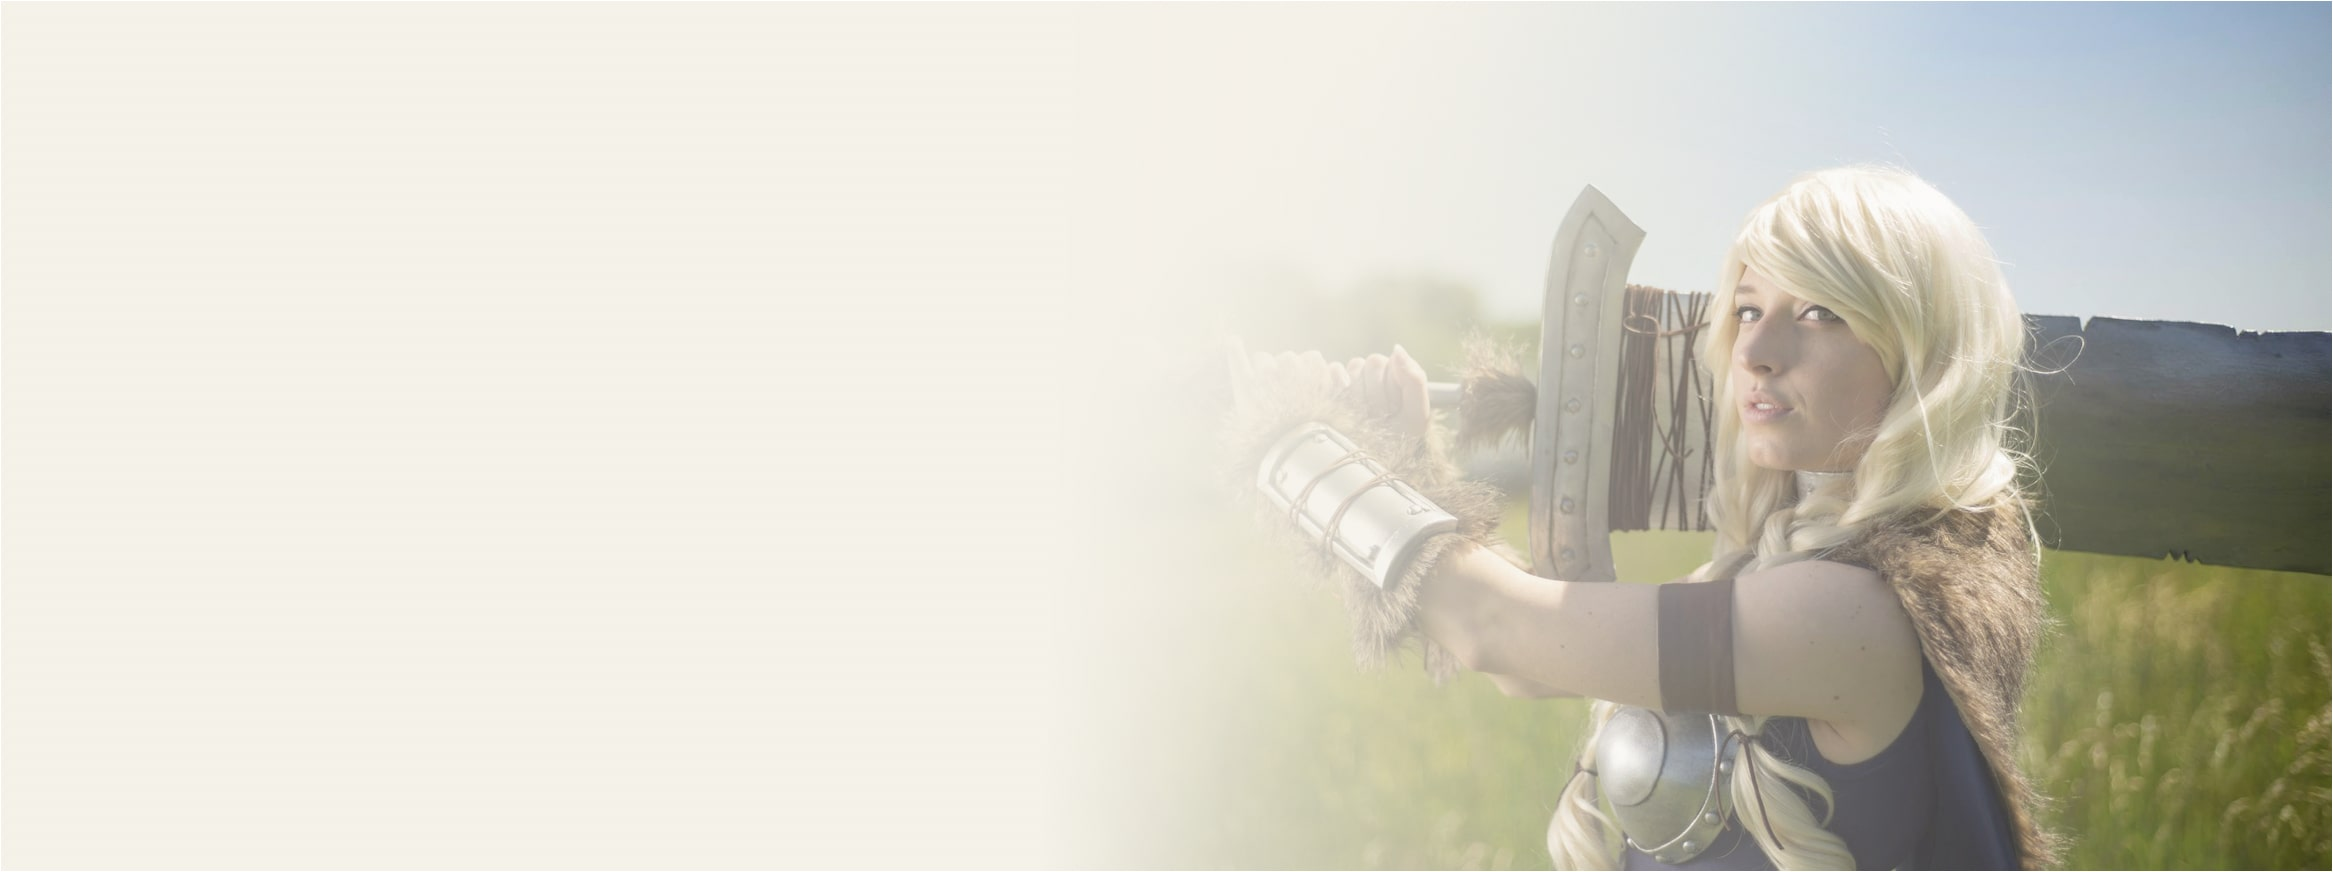 Cosplay-Background-Elyse-min